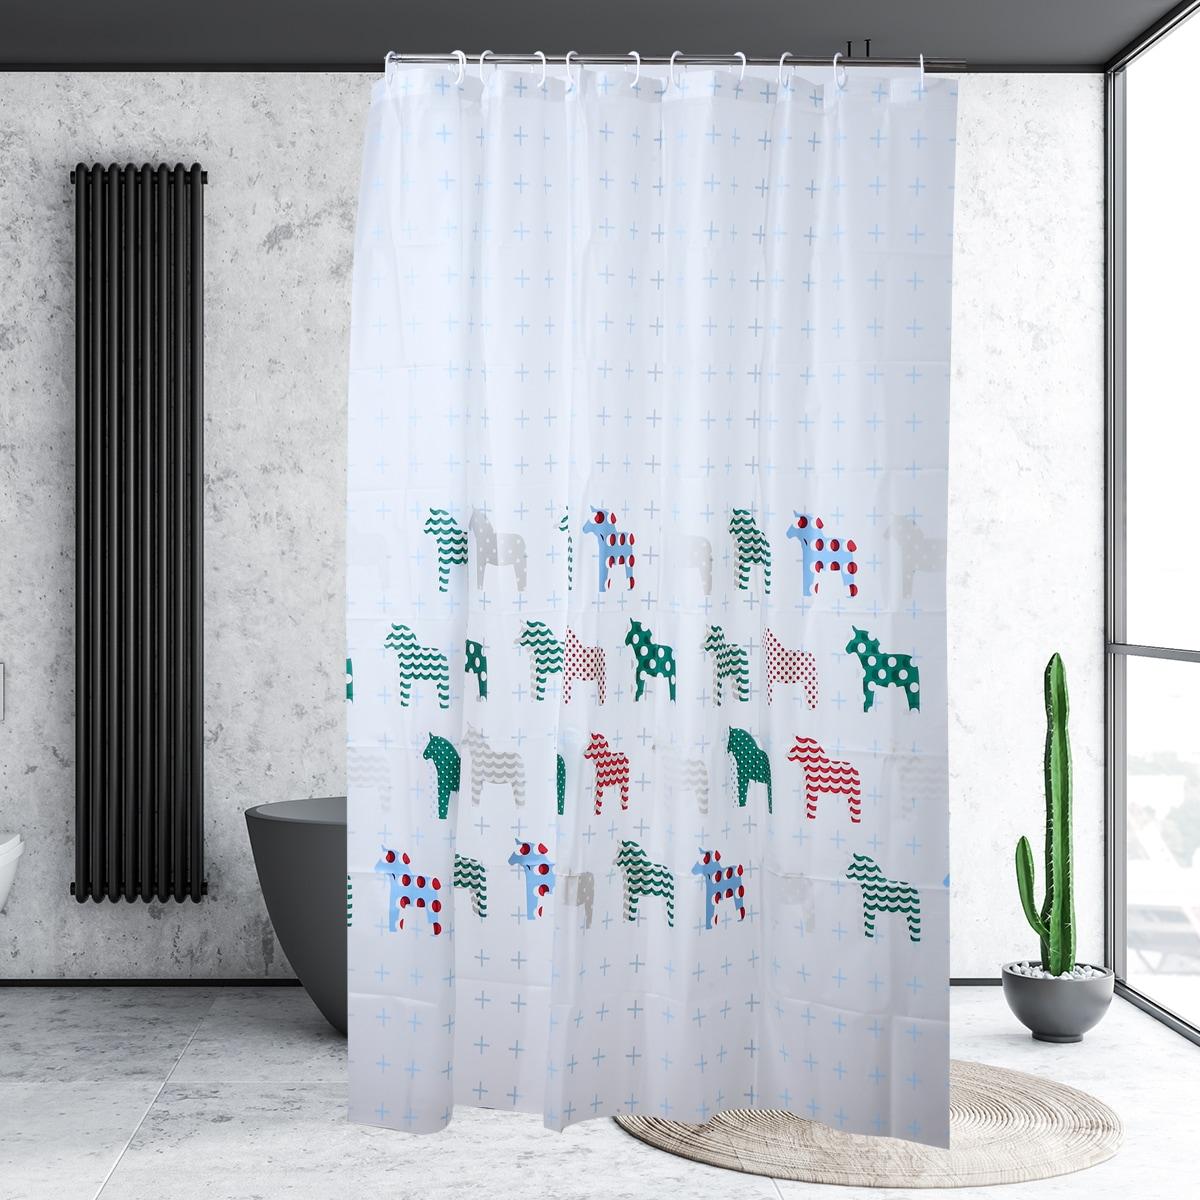 Cartoon Graphic Shower Curtain